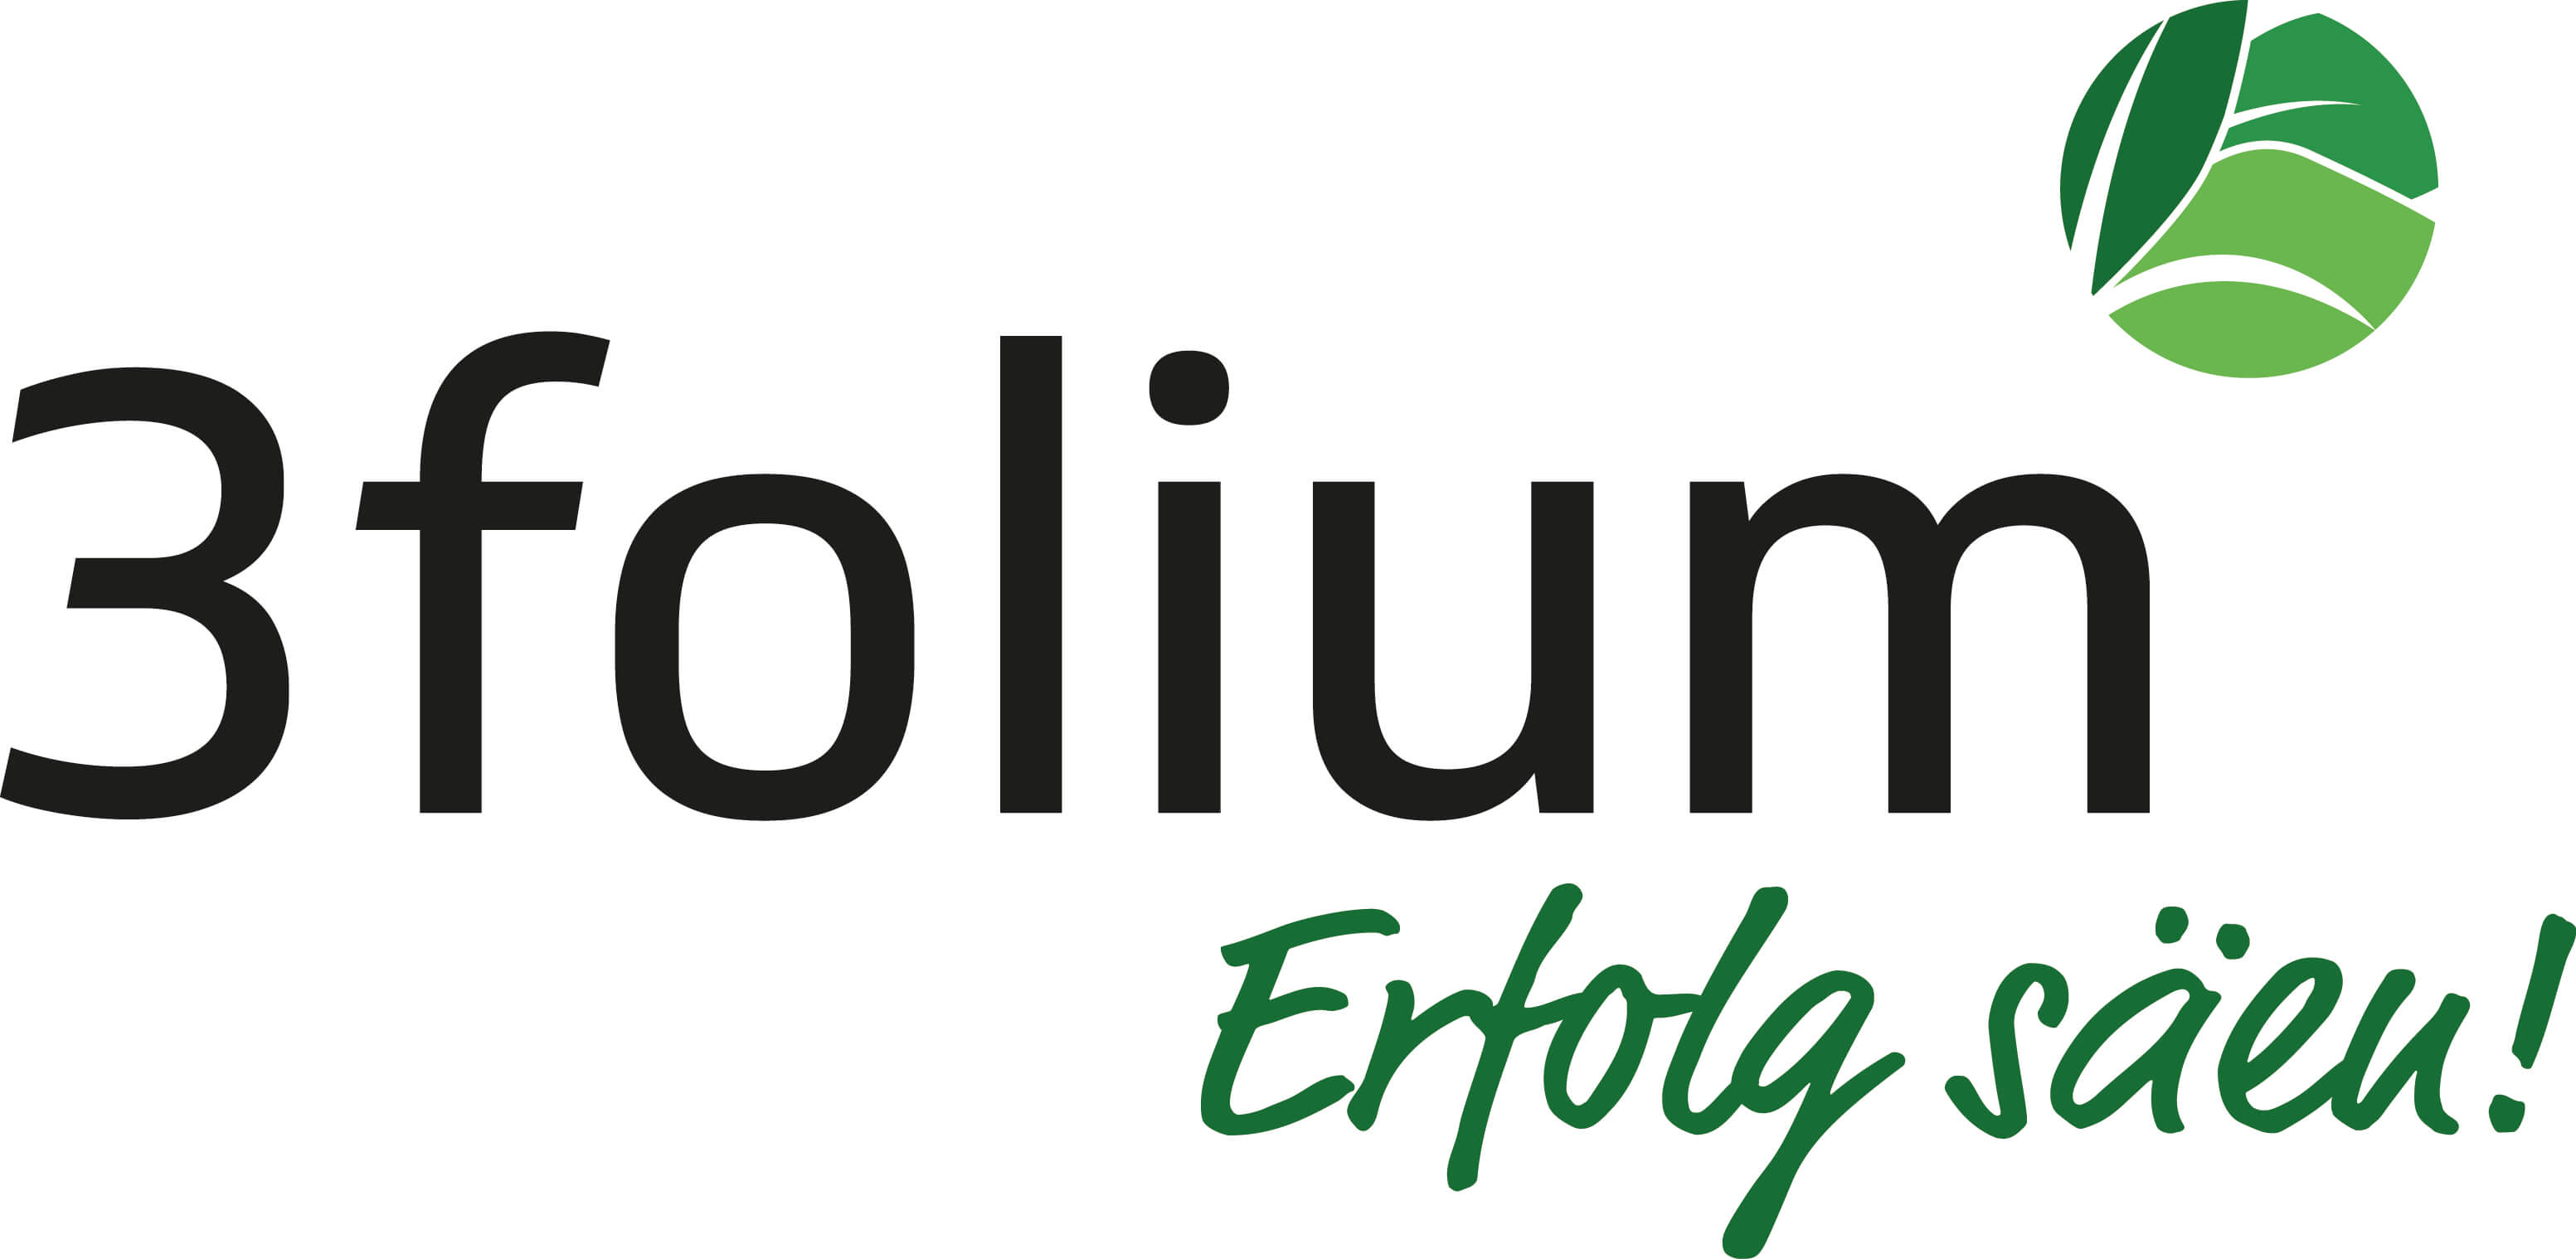 3folium GmbH